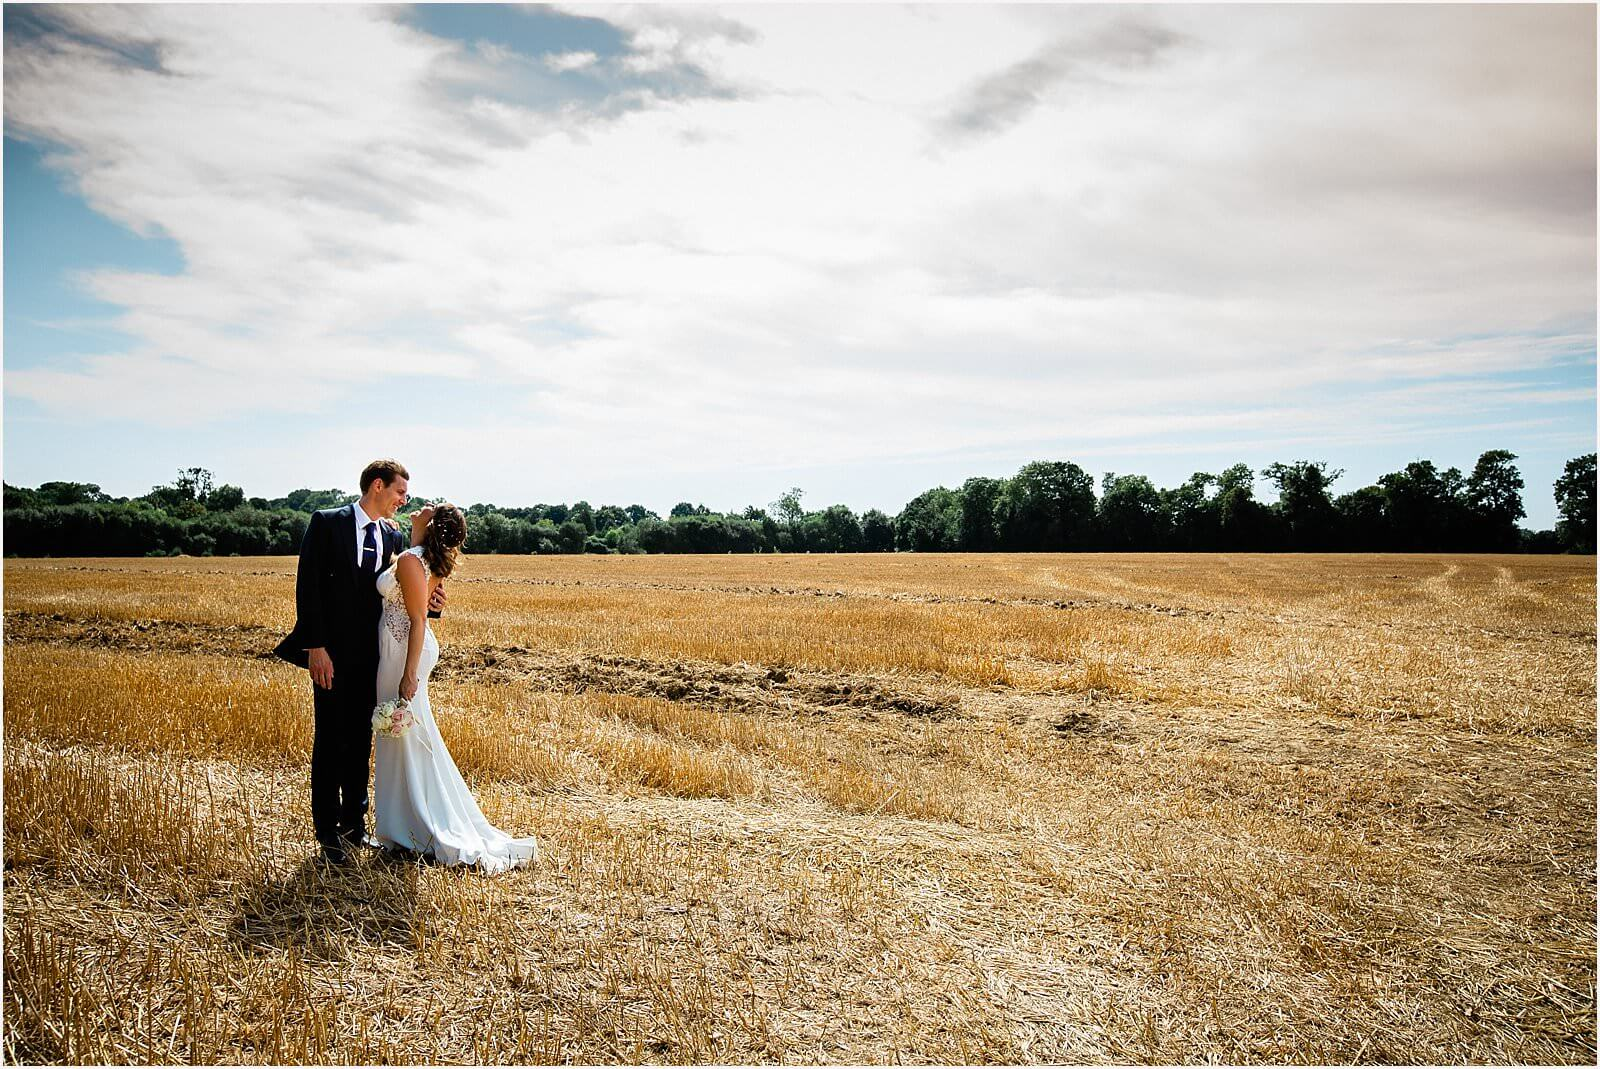 Chateau de Courtomer Wedding | Chantel & Evan 37